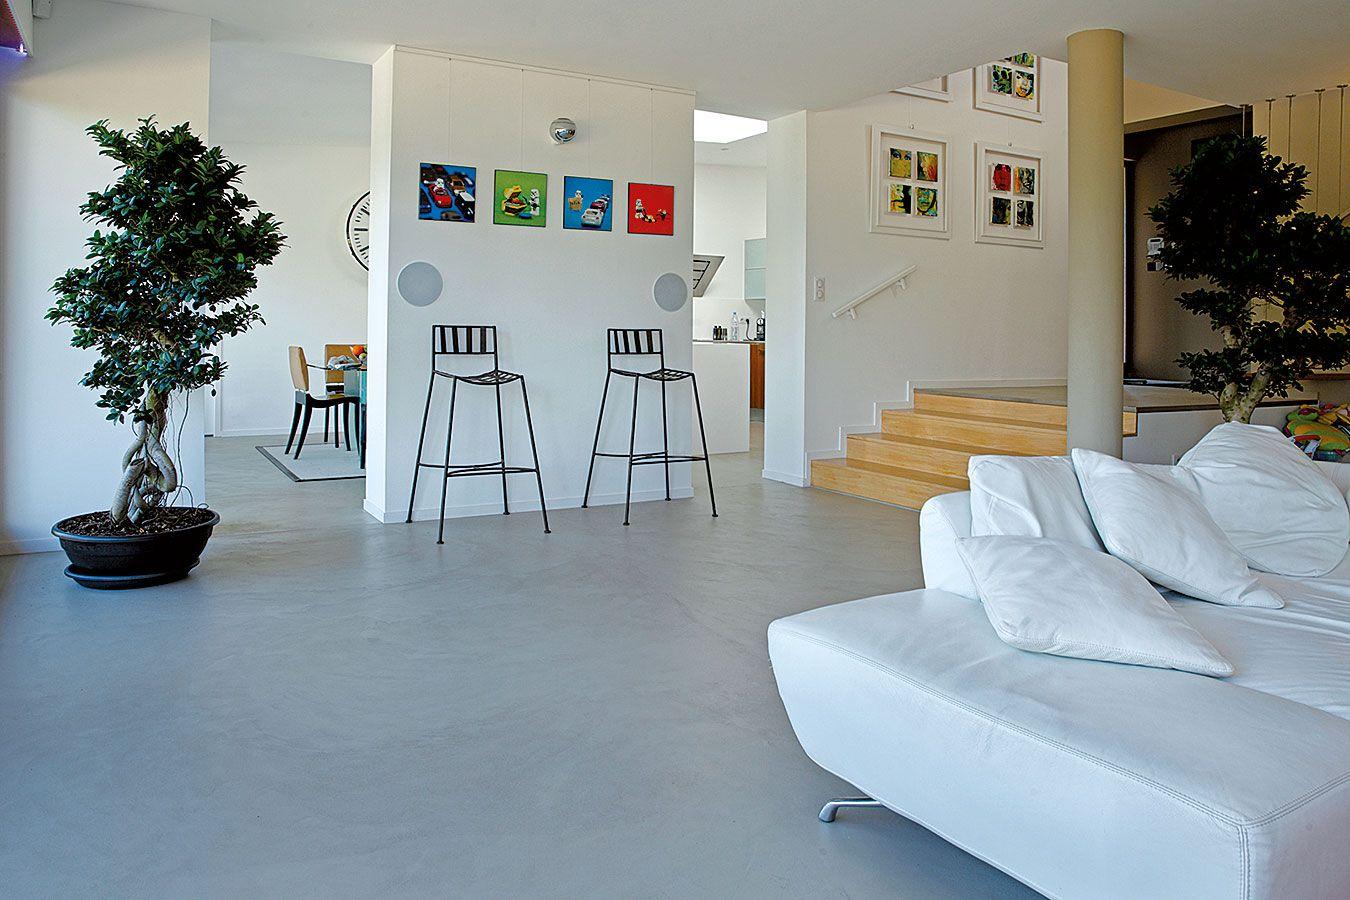 b ton cir liss gr ge marius aurenti lyon 3 me copyright edwige lamy mati res pinterest. Black Bedroom Furniture Sets. Home Design Ideas